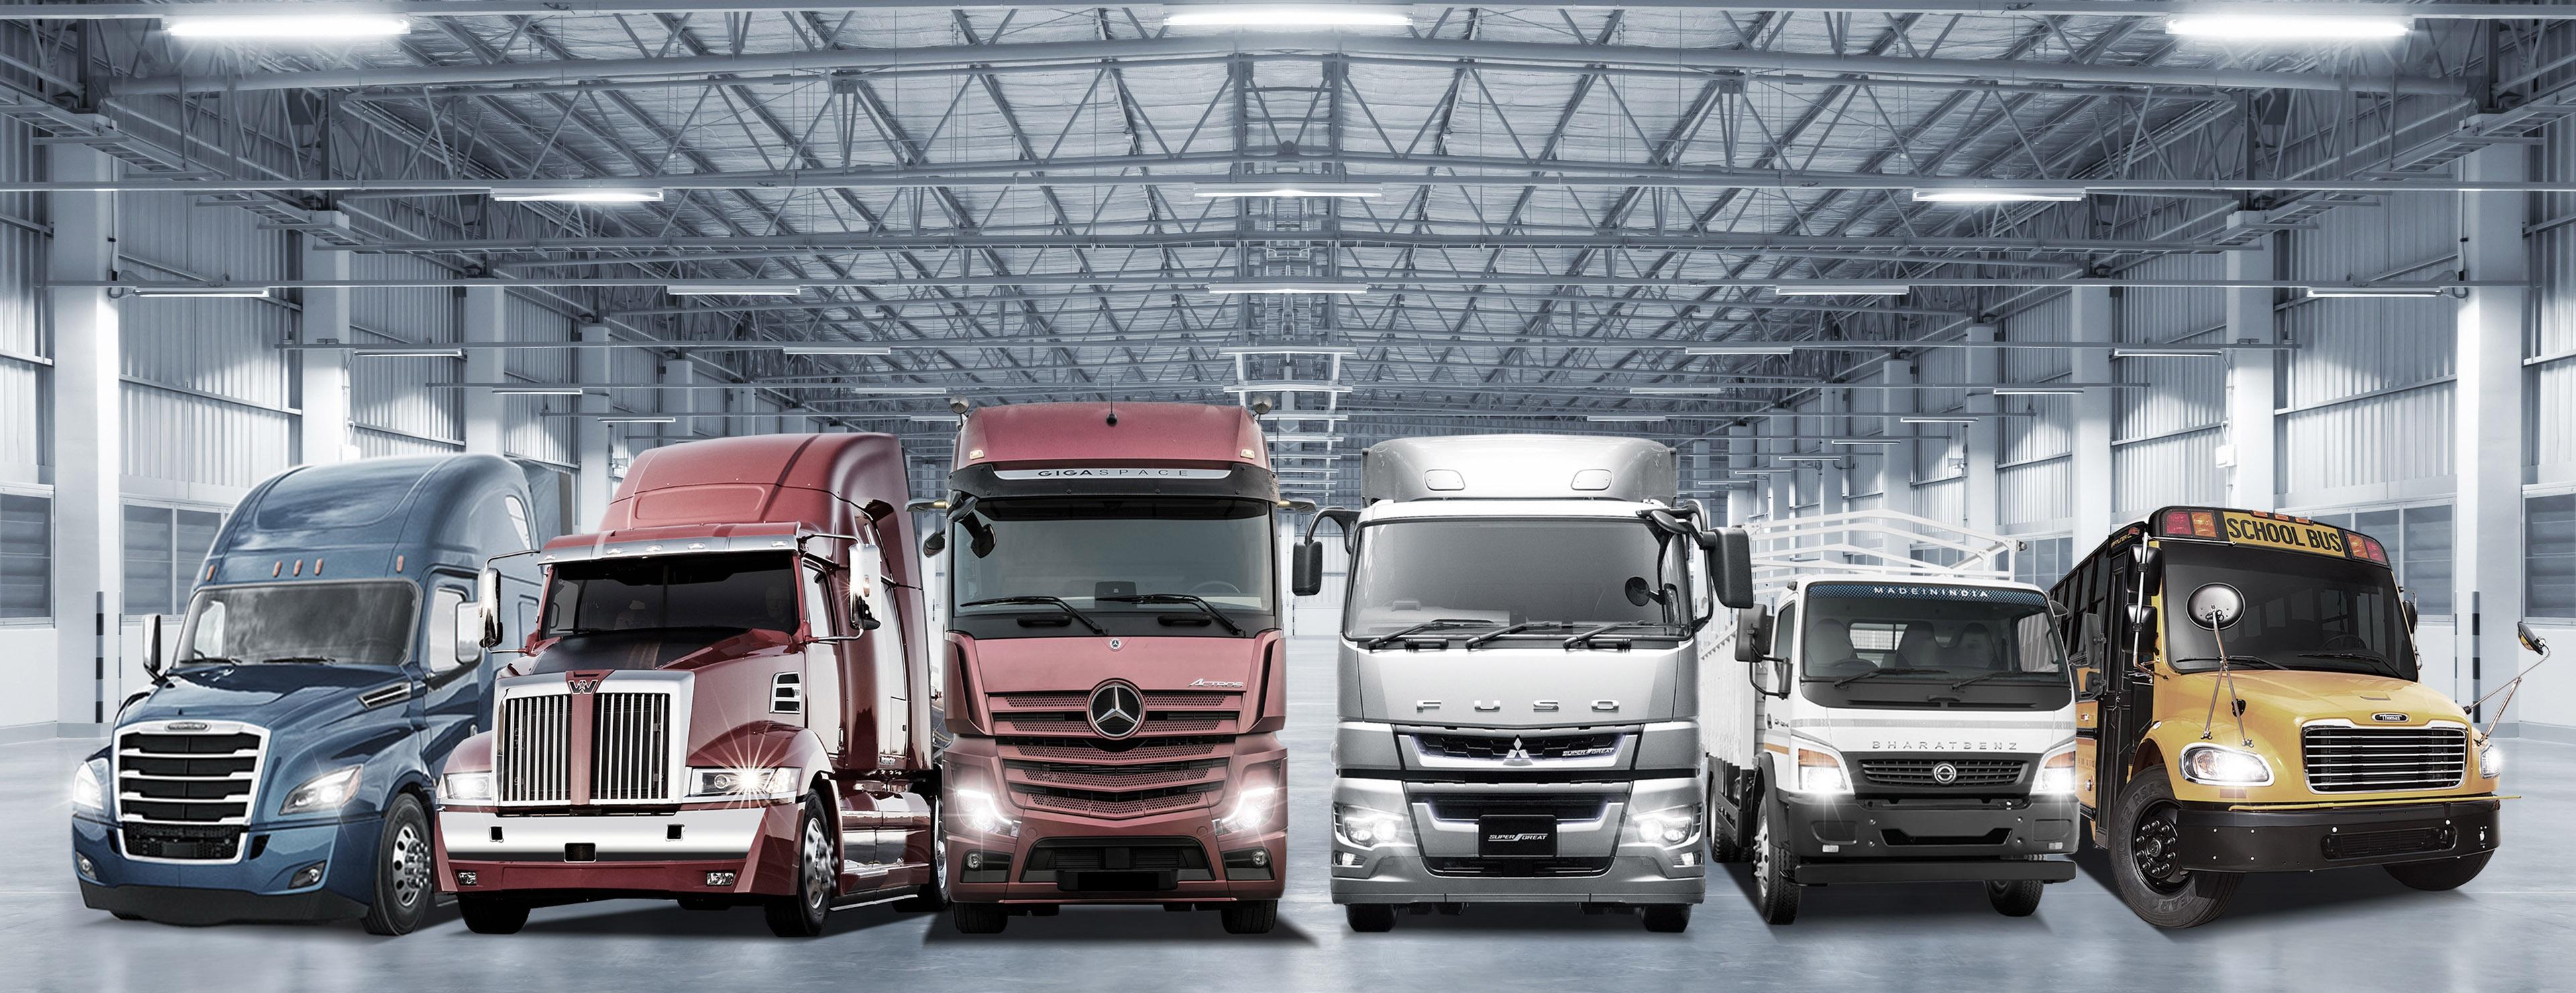 Brand Daimler